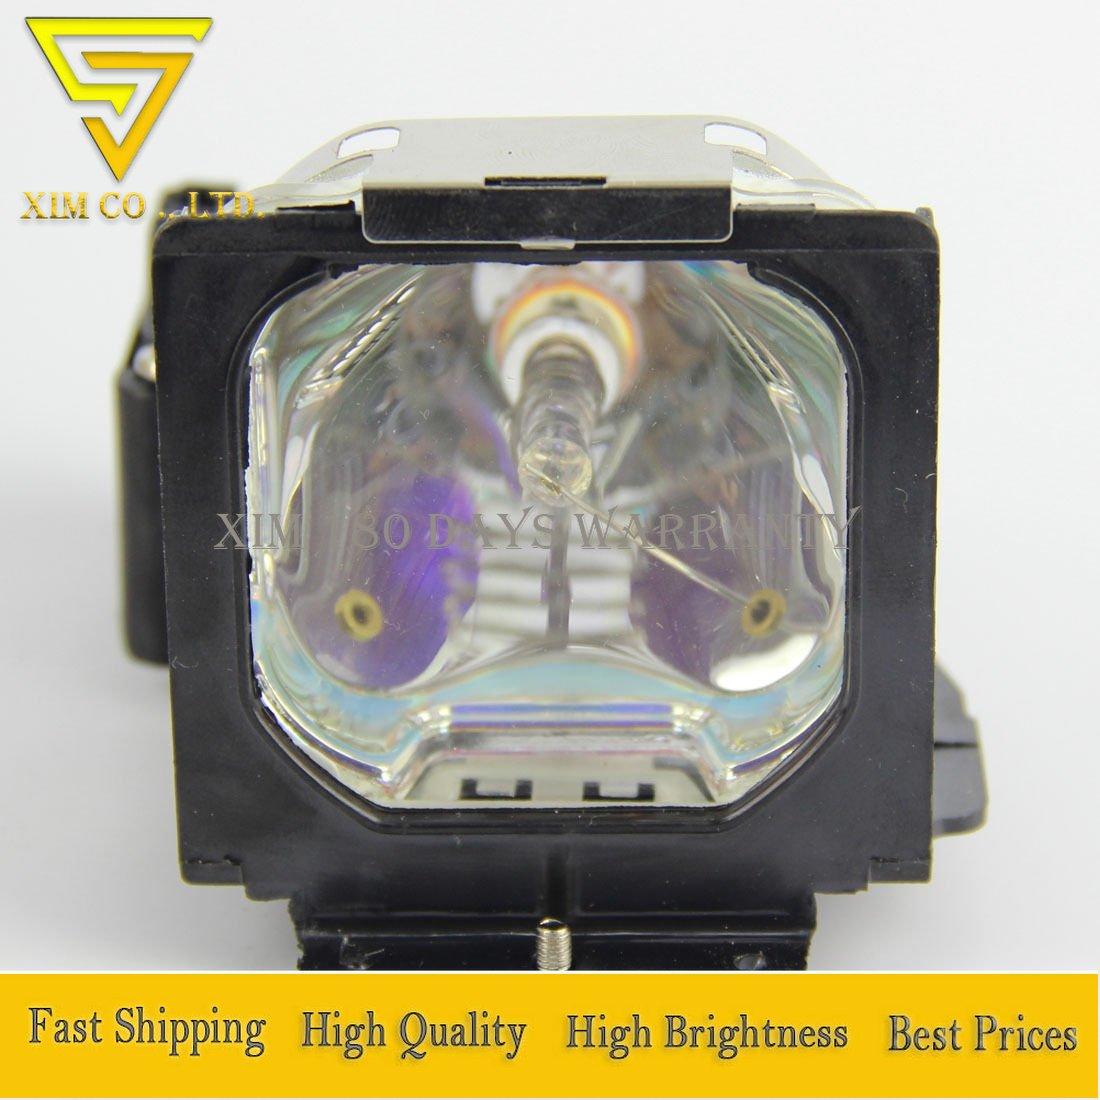 610-309-2706/POA-LMP55 استبدال العارض مصباح مع الإسكان ل سانيو PLC-XU47 PLC-XU48 PLC-XU25 PLC-XU51 PLC-XU55 PLC-XT15KU